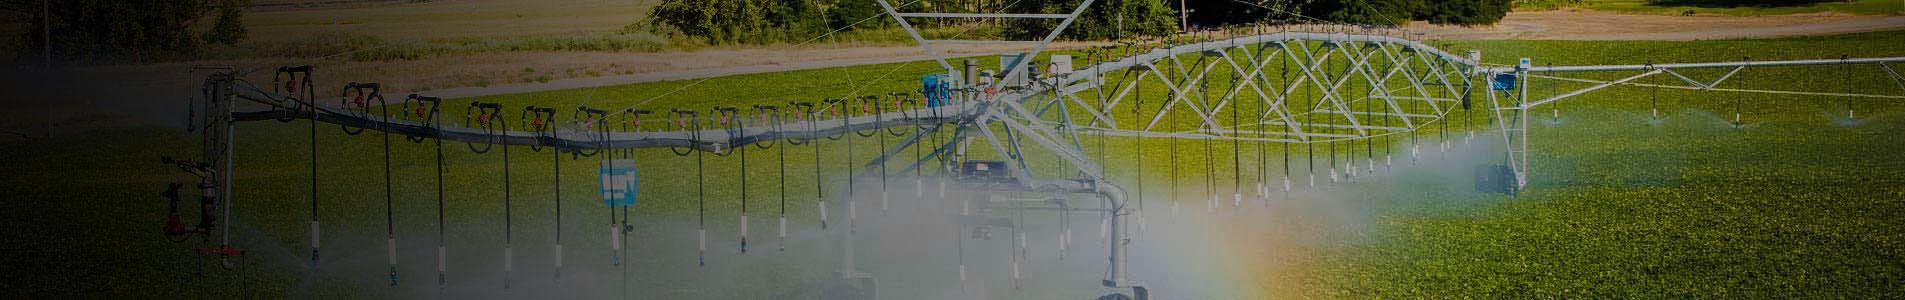 trimble irrigate-iq uniform corner - water application management solution